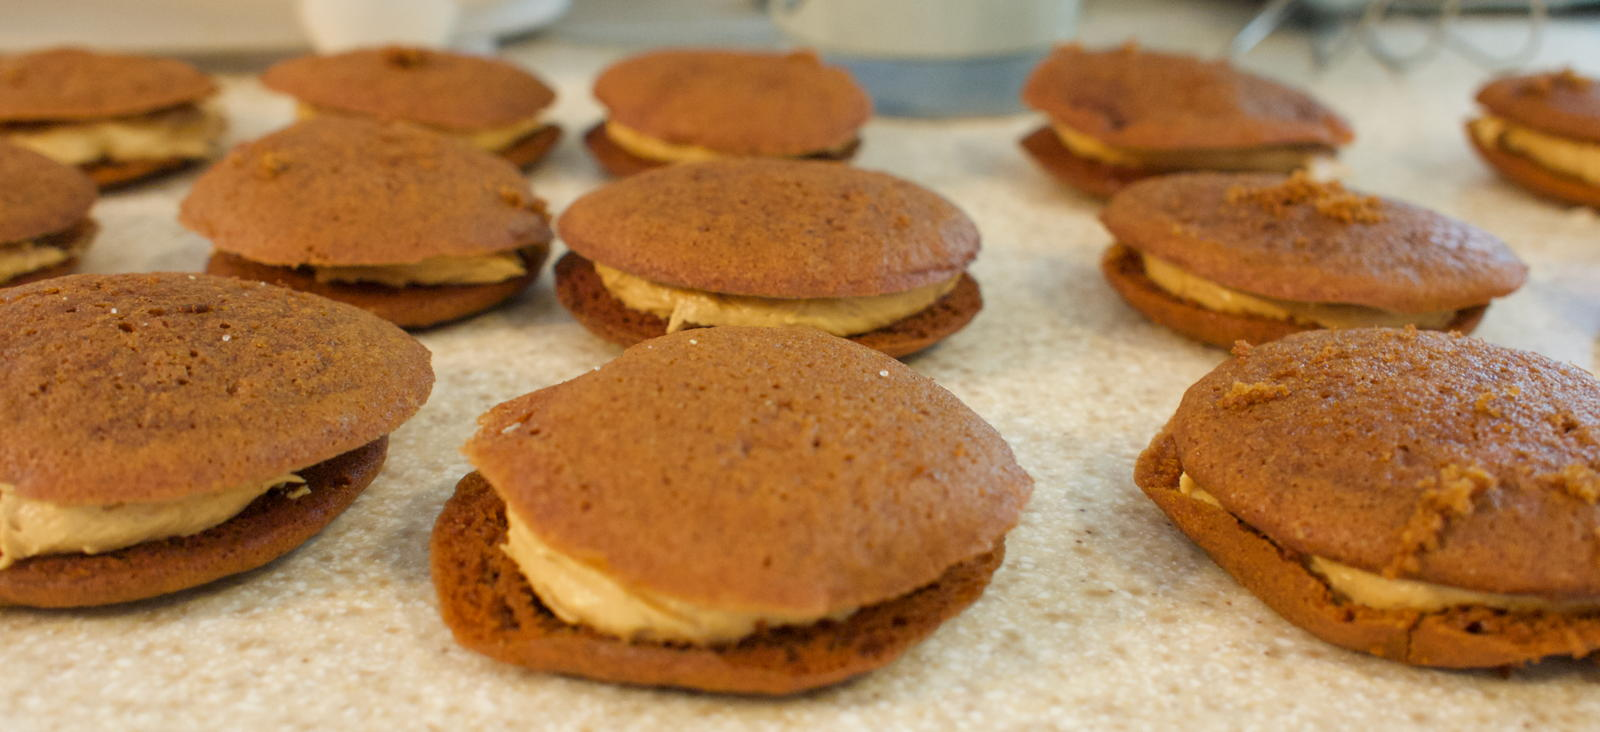 Molasses ginger sandwich cookies